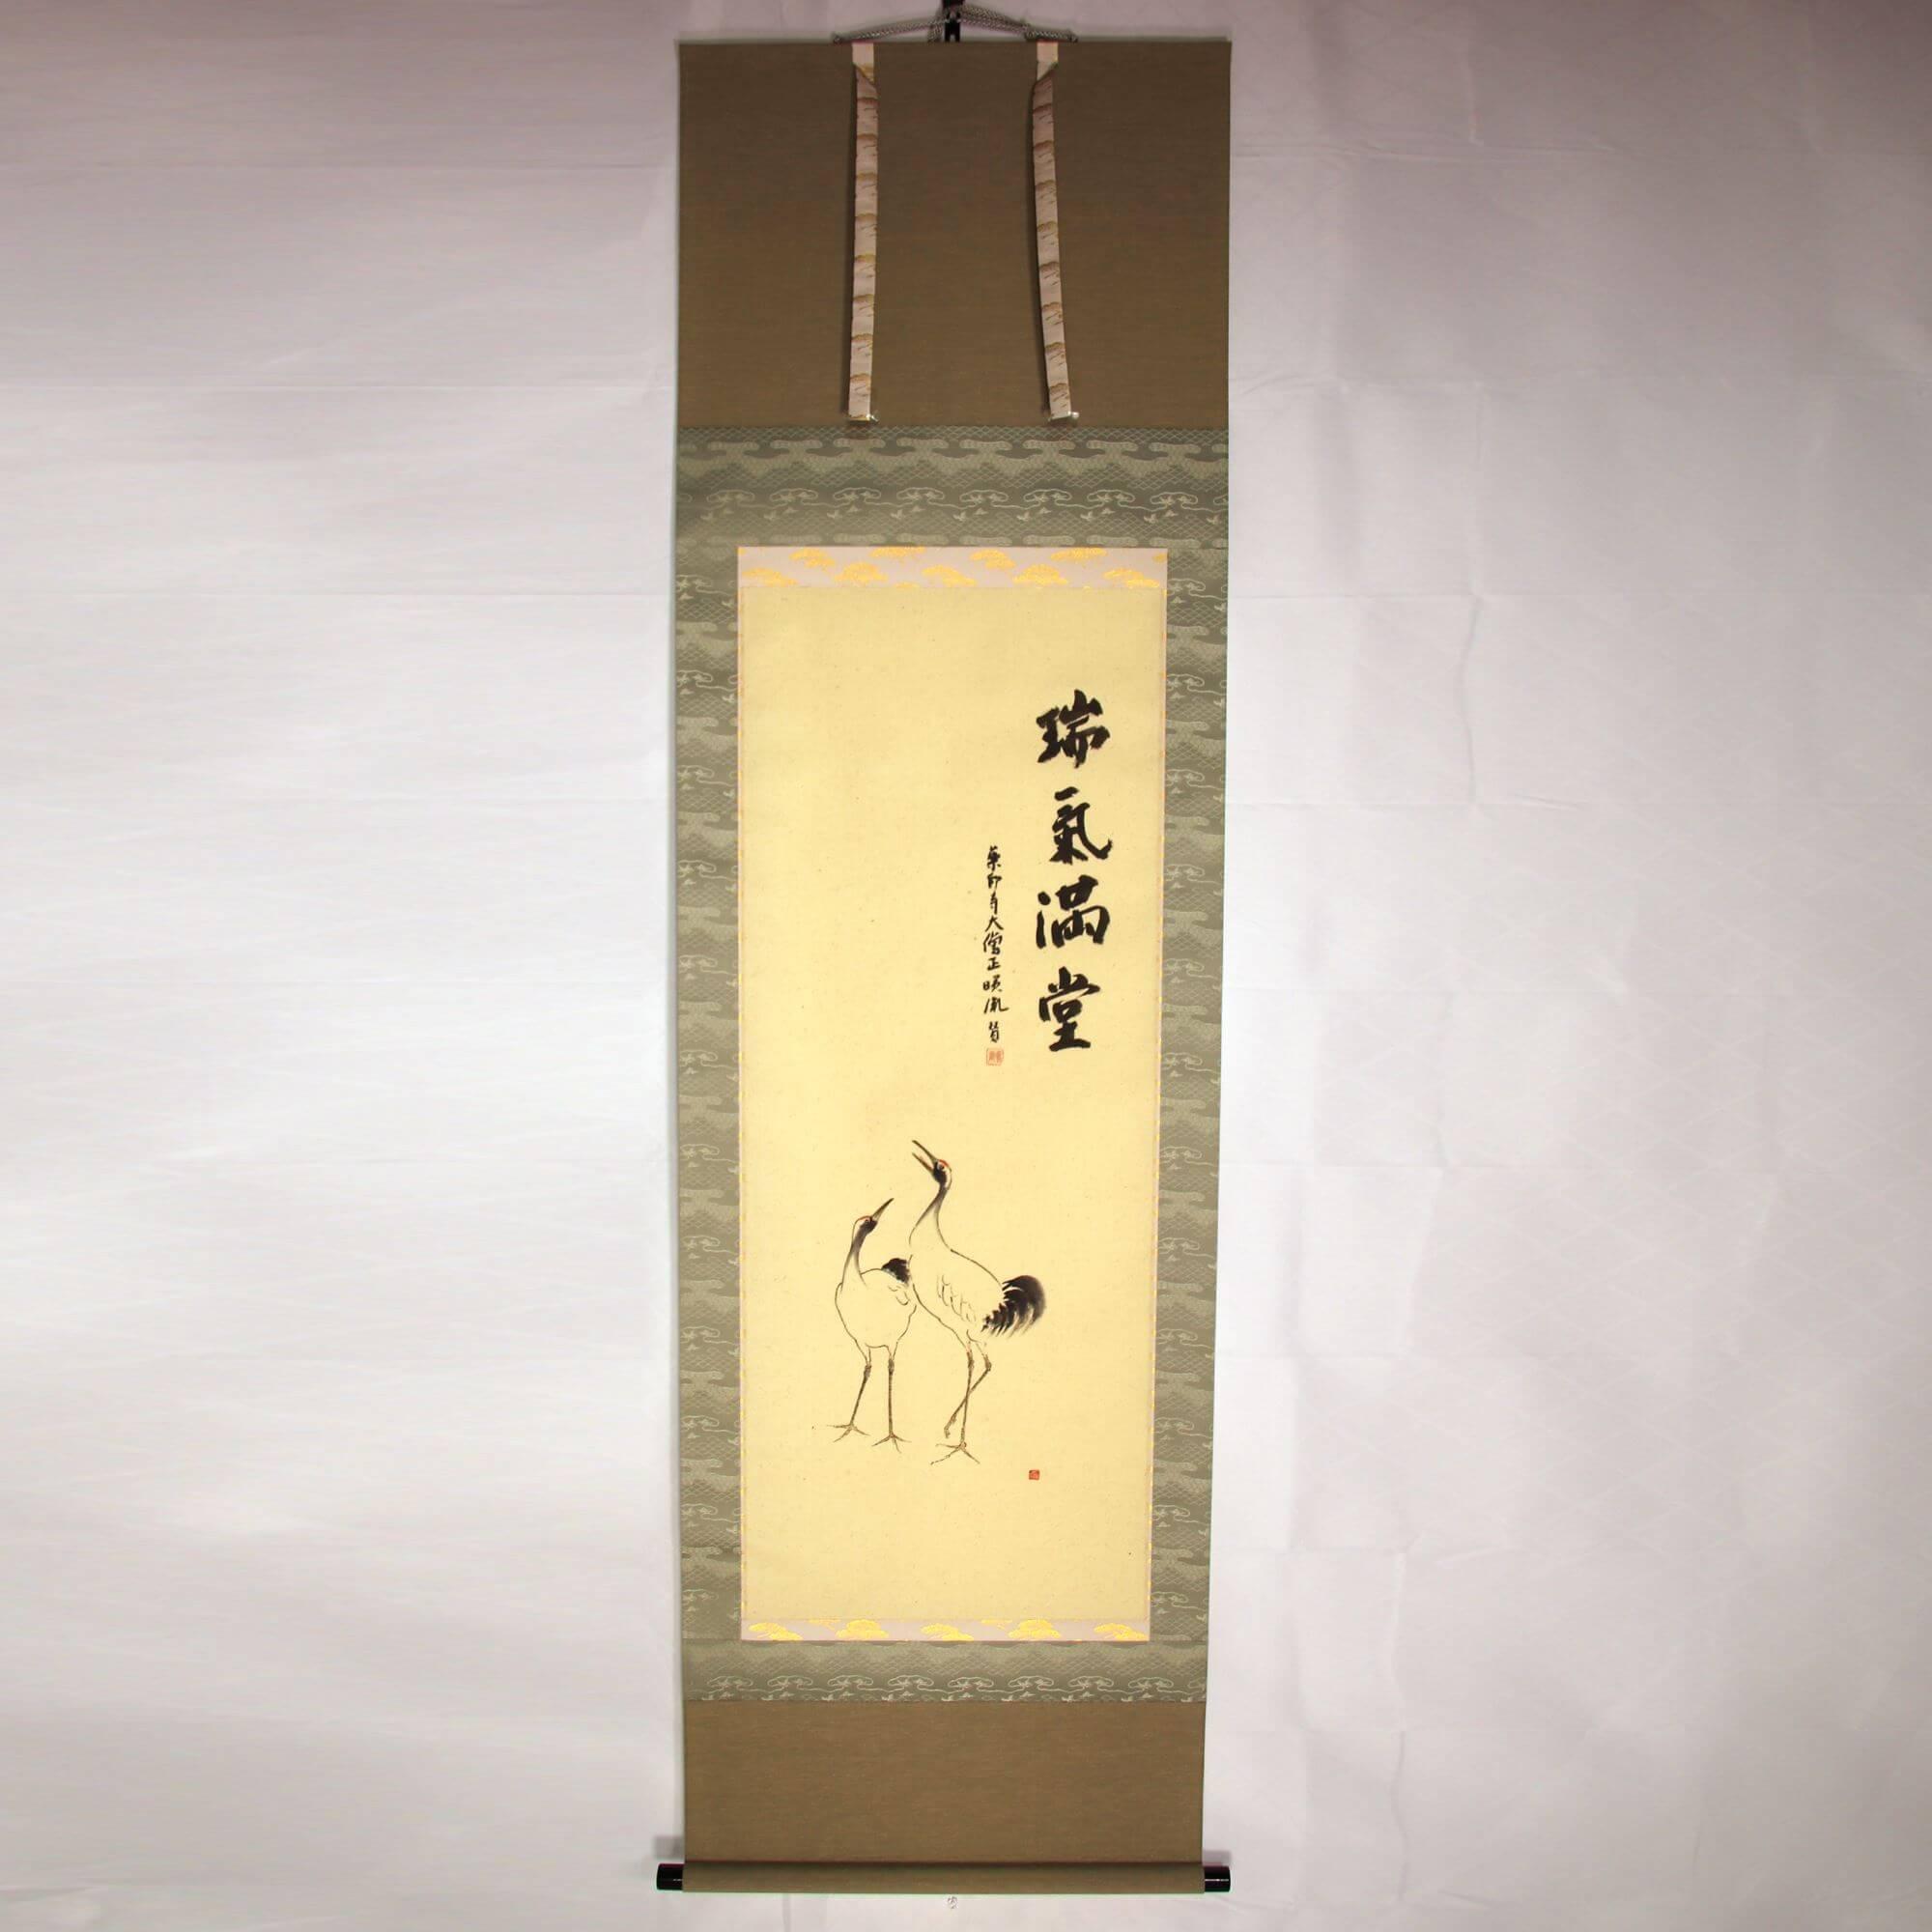 A Pair of Cranes / Eiin Yasuda & Katsunobu Kawahito